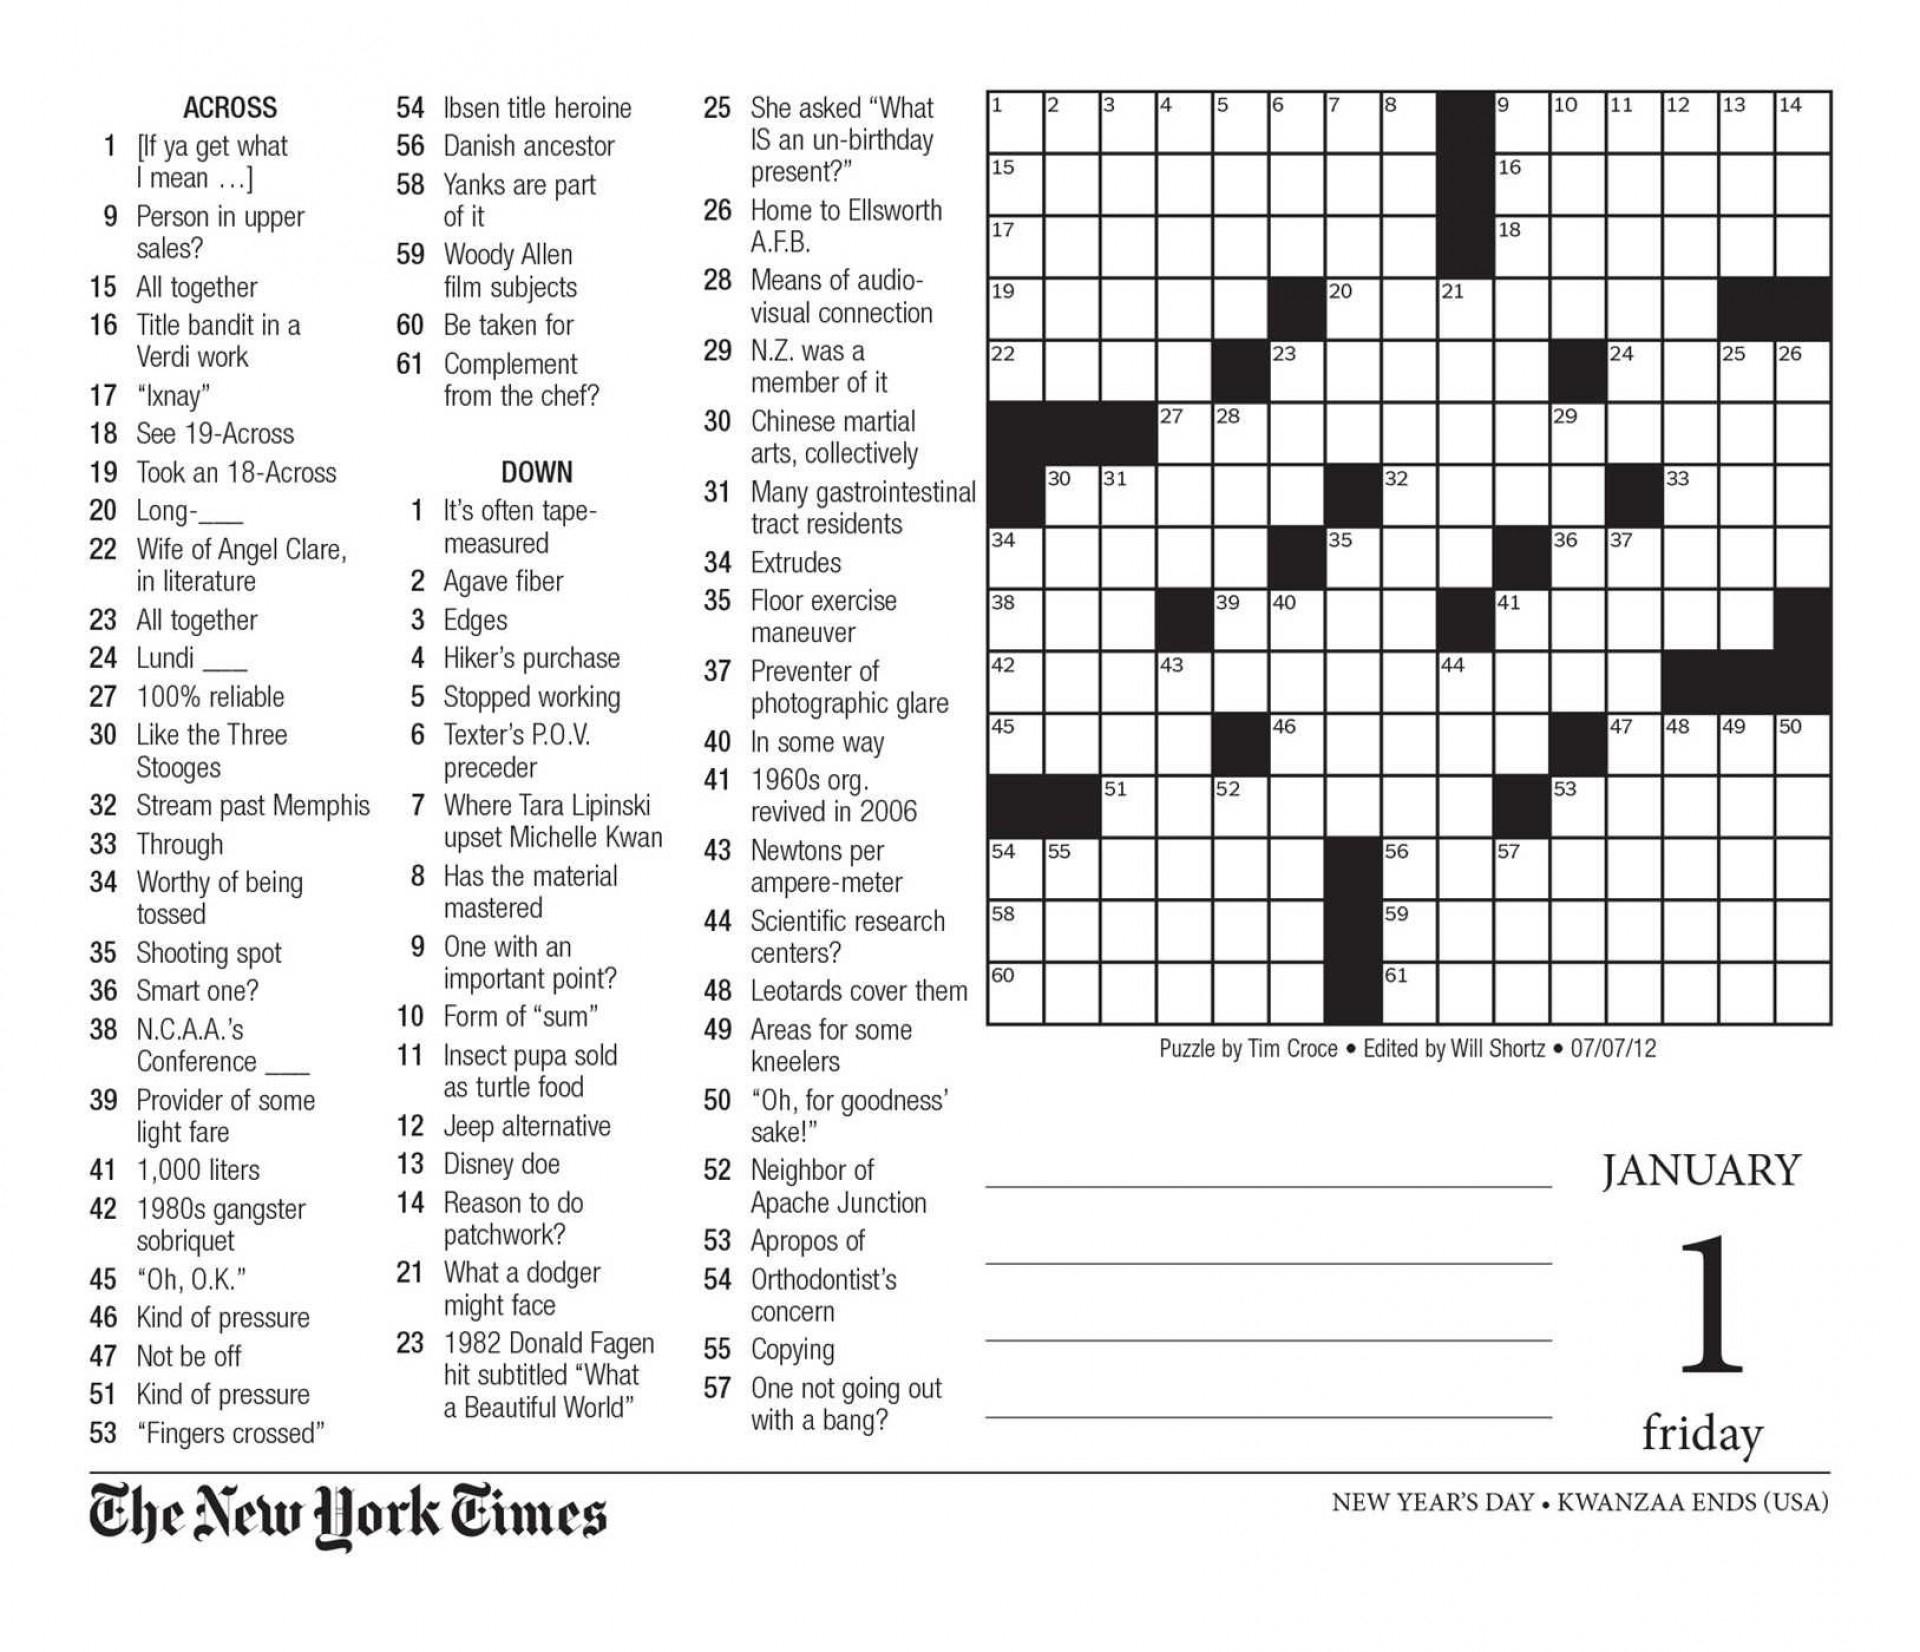 Free Printable Large Print Crossword Puzzles | M3U8 - Printable Crossword Puzzle For Seniors